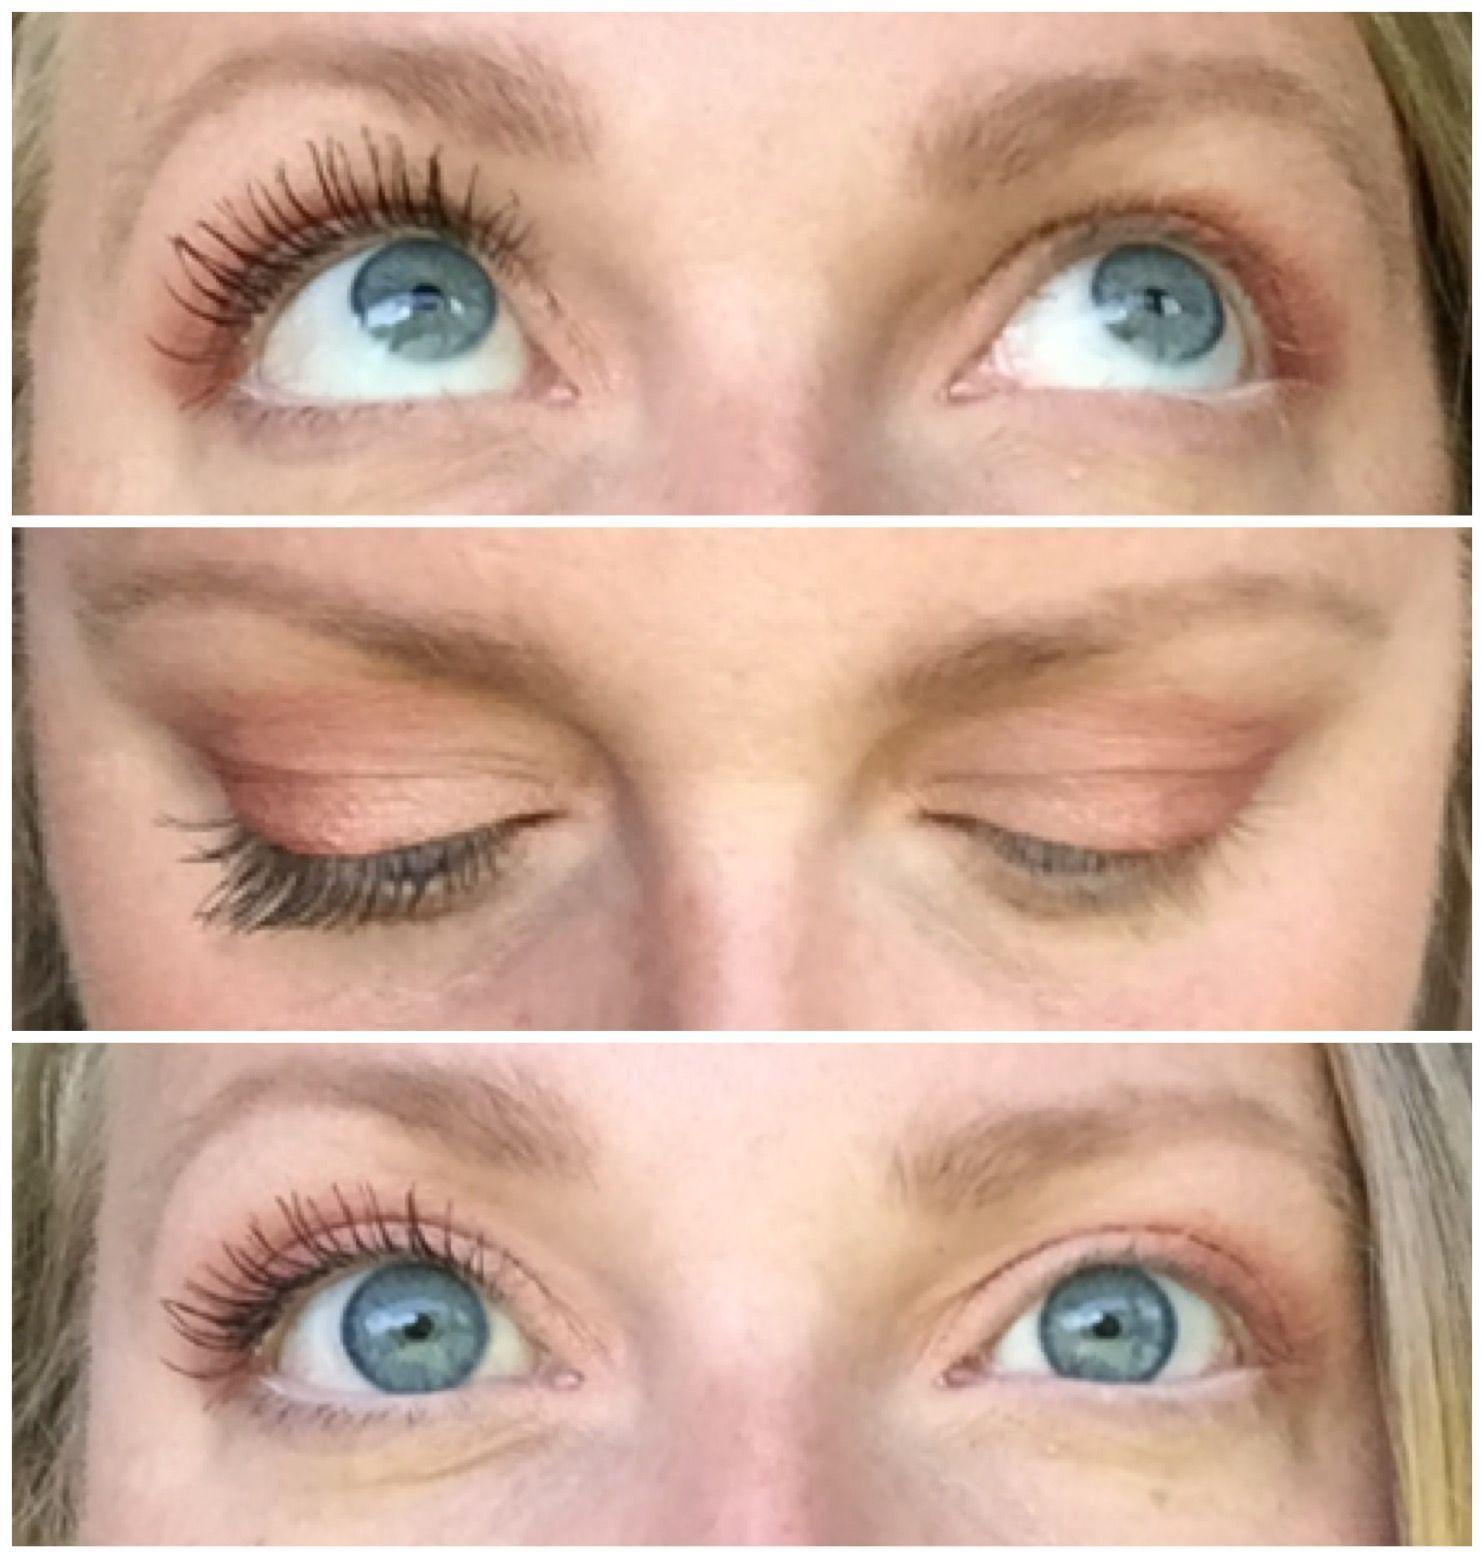 031fa3f2677 Best Mascara 2017 Mascara Brands, mascara for sensitive eyes, best mascara  for length,